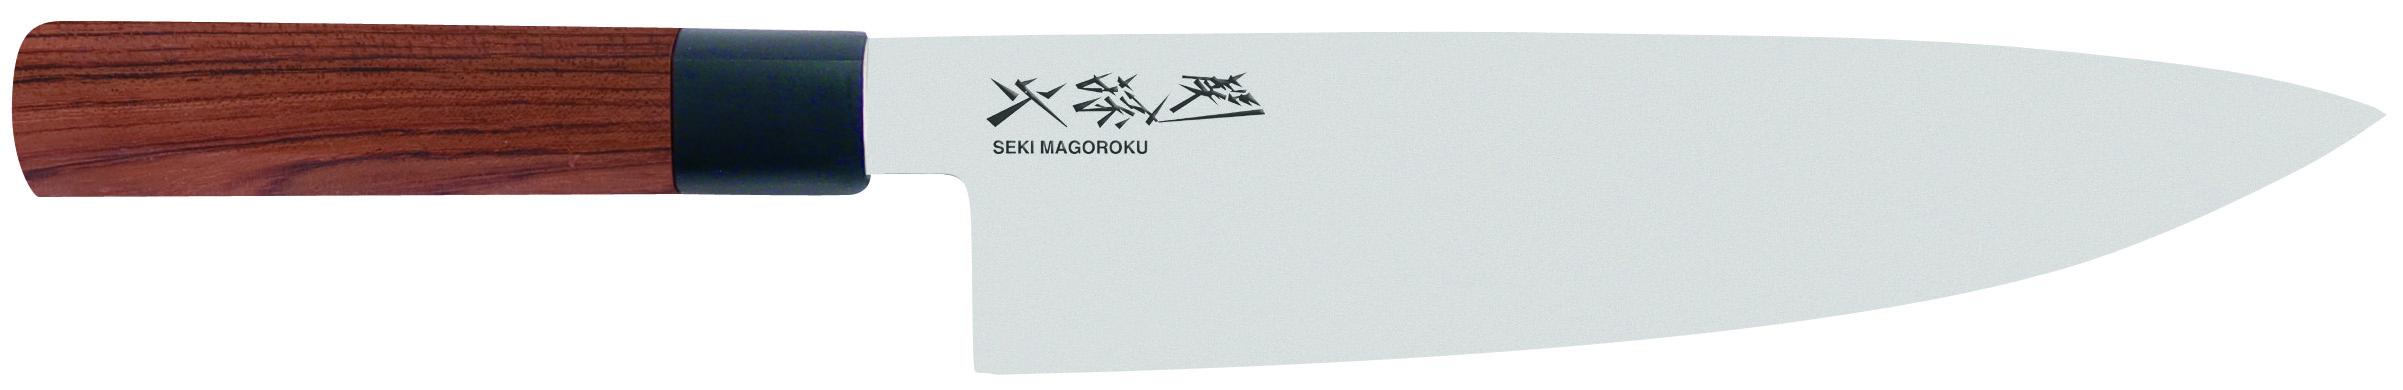 Nôž šéfkuchára Seki Magoroku MGR-0200C